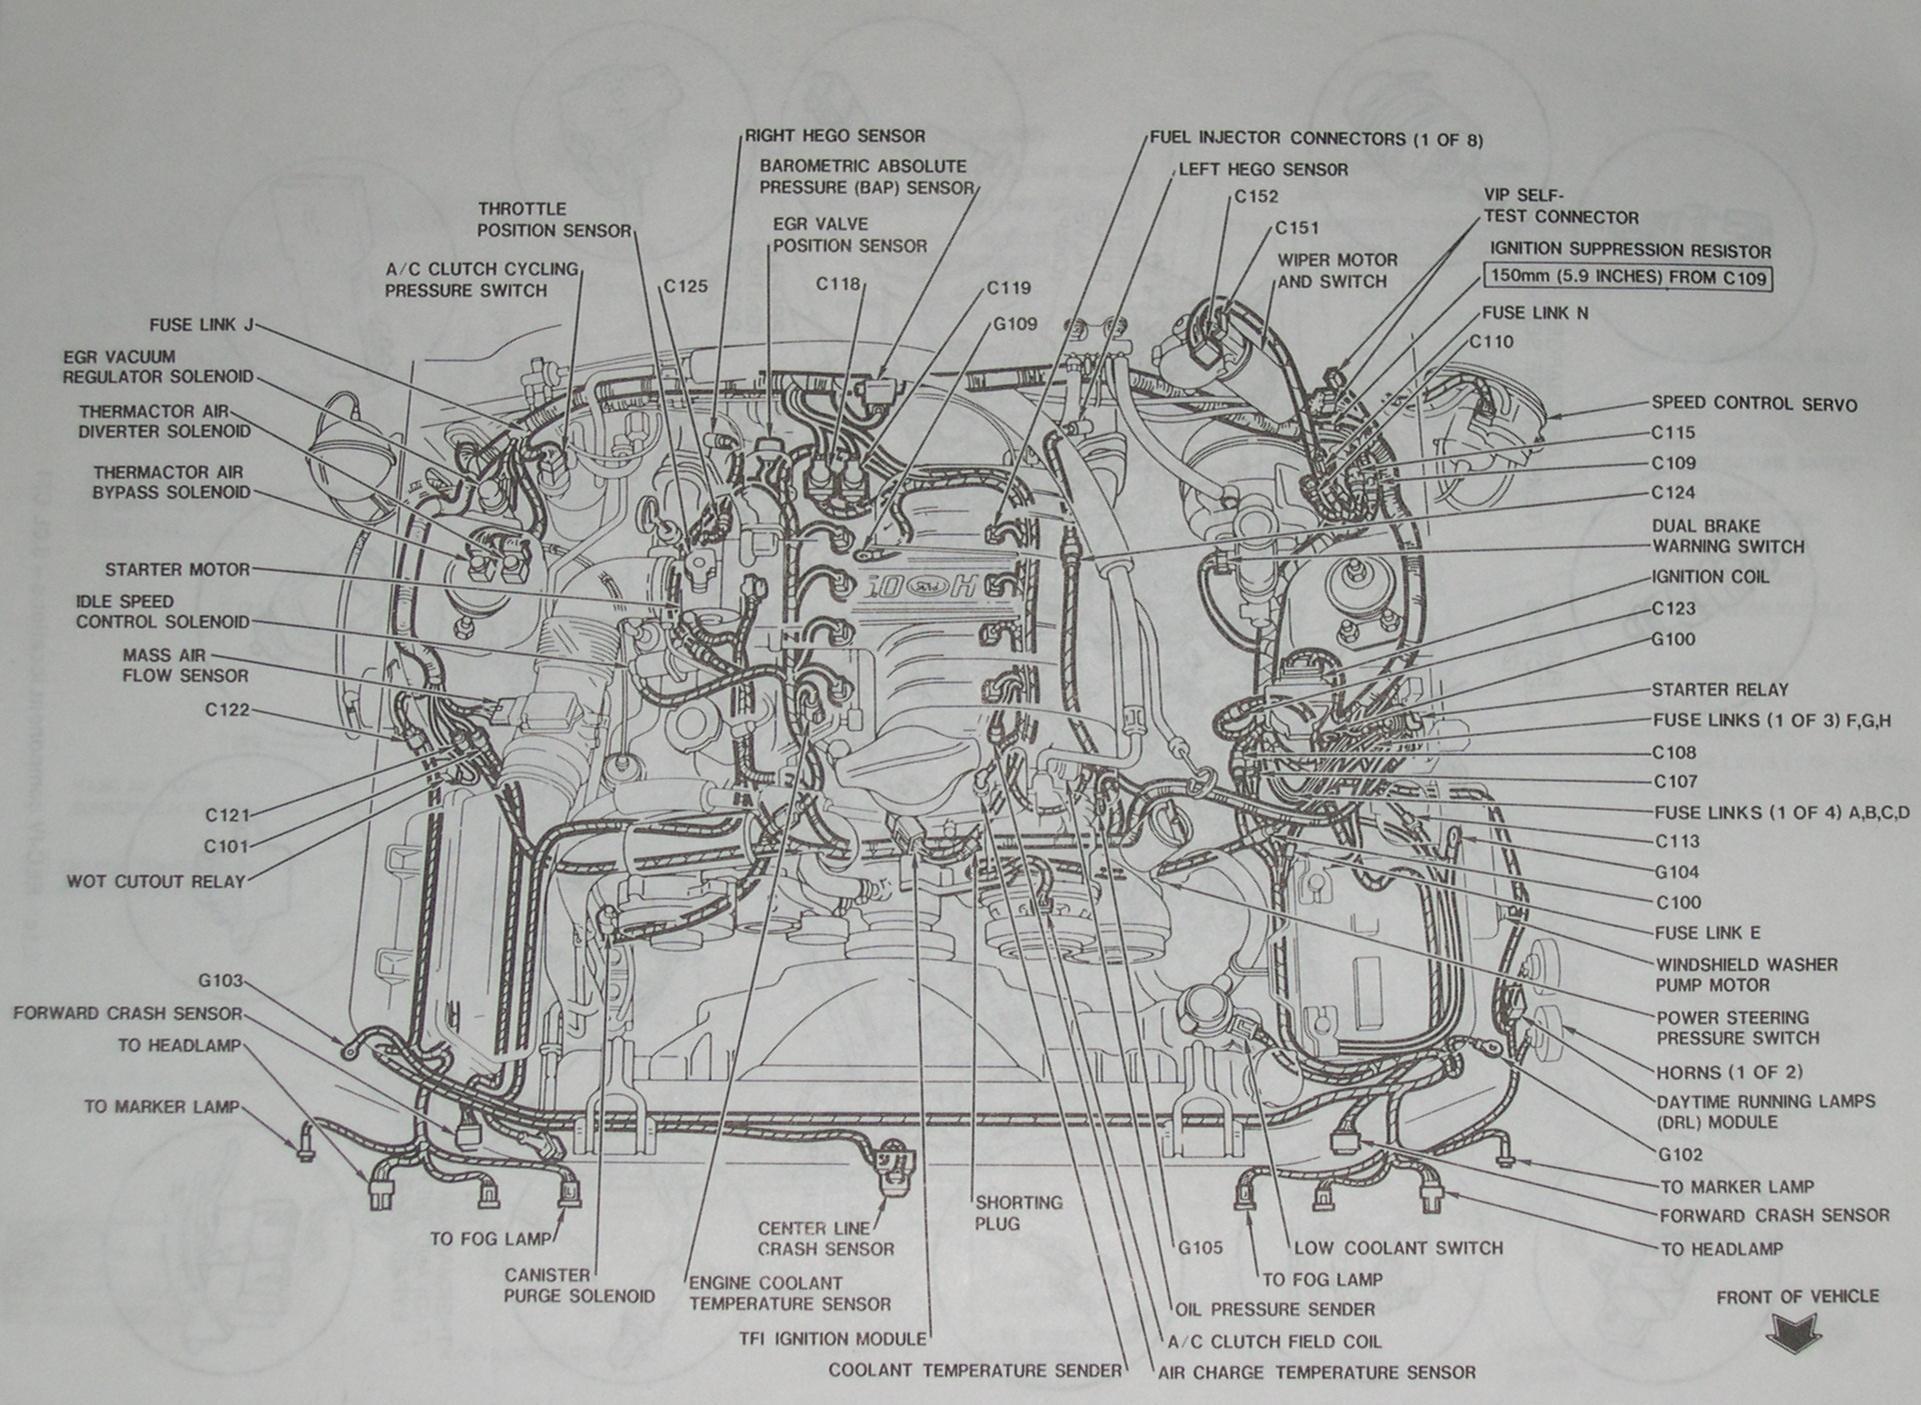 hight resolution of 2002 mustang gt fuse box wiring library rh 84 kandelhof restaurant de 1996 3 8 v6 mustang engine pictures 1996 mustang 3 8 engine